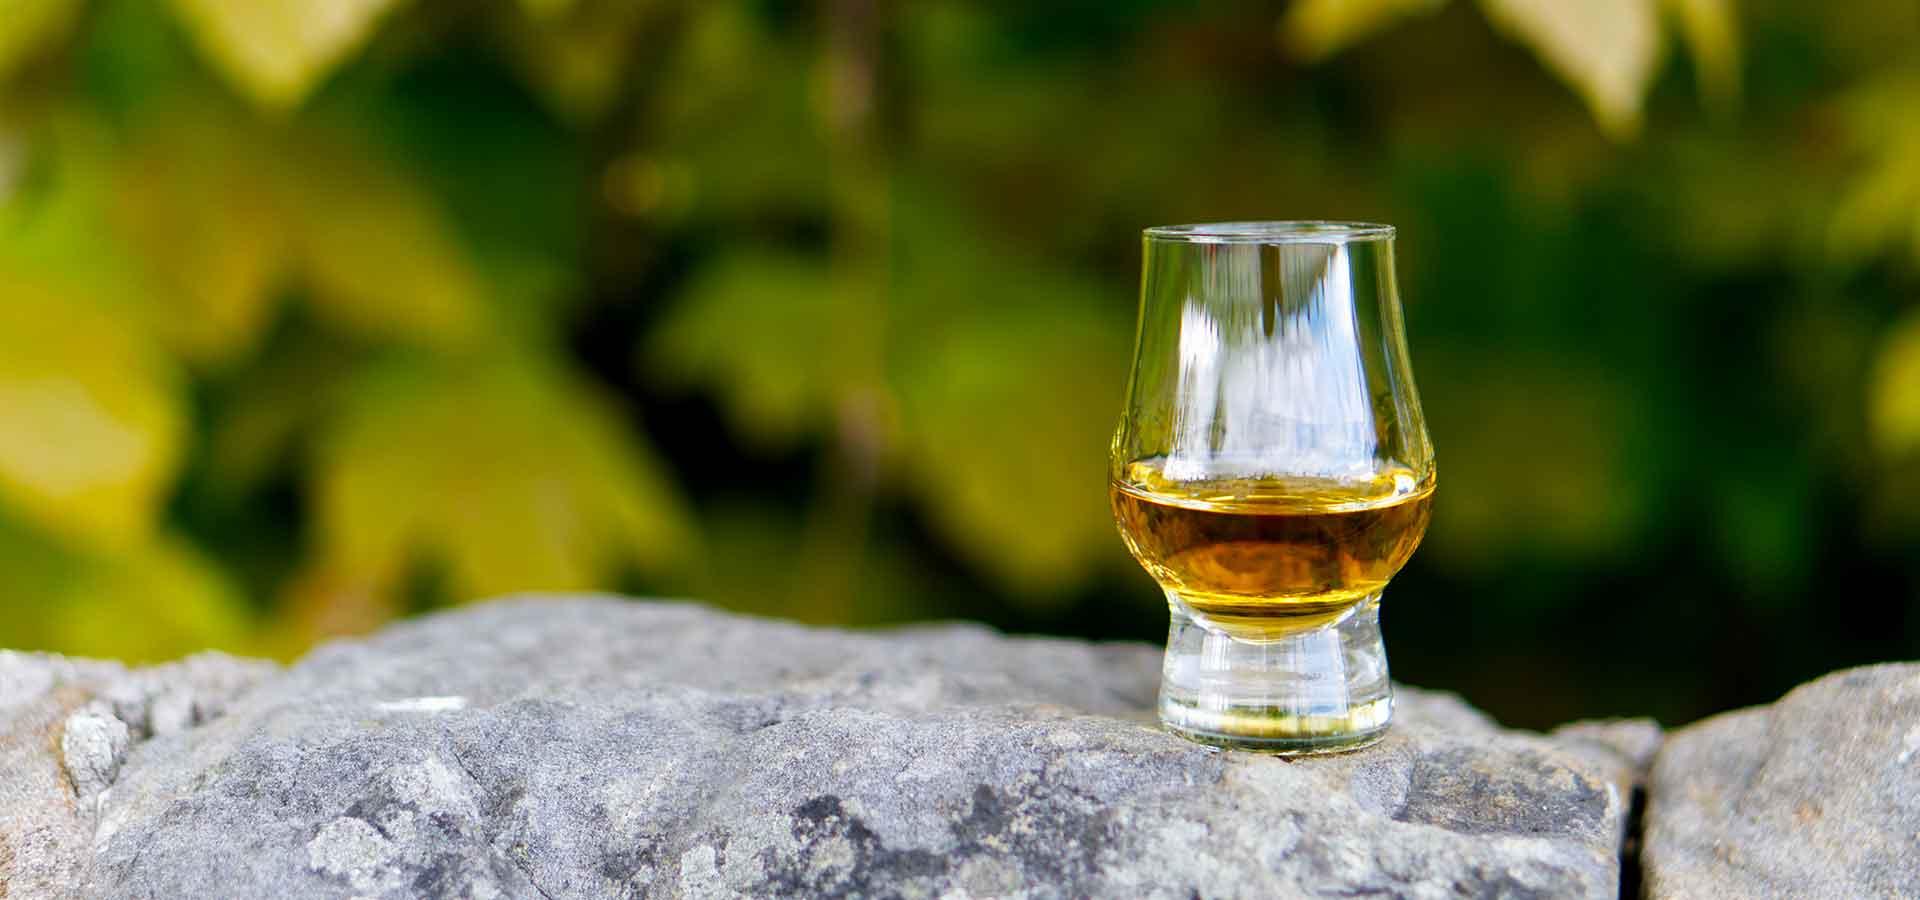 Voyage-Ecosse-Irlande-whisky-scotch